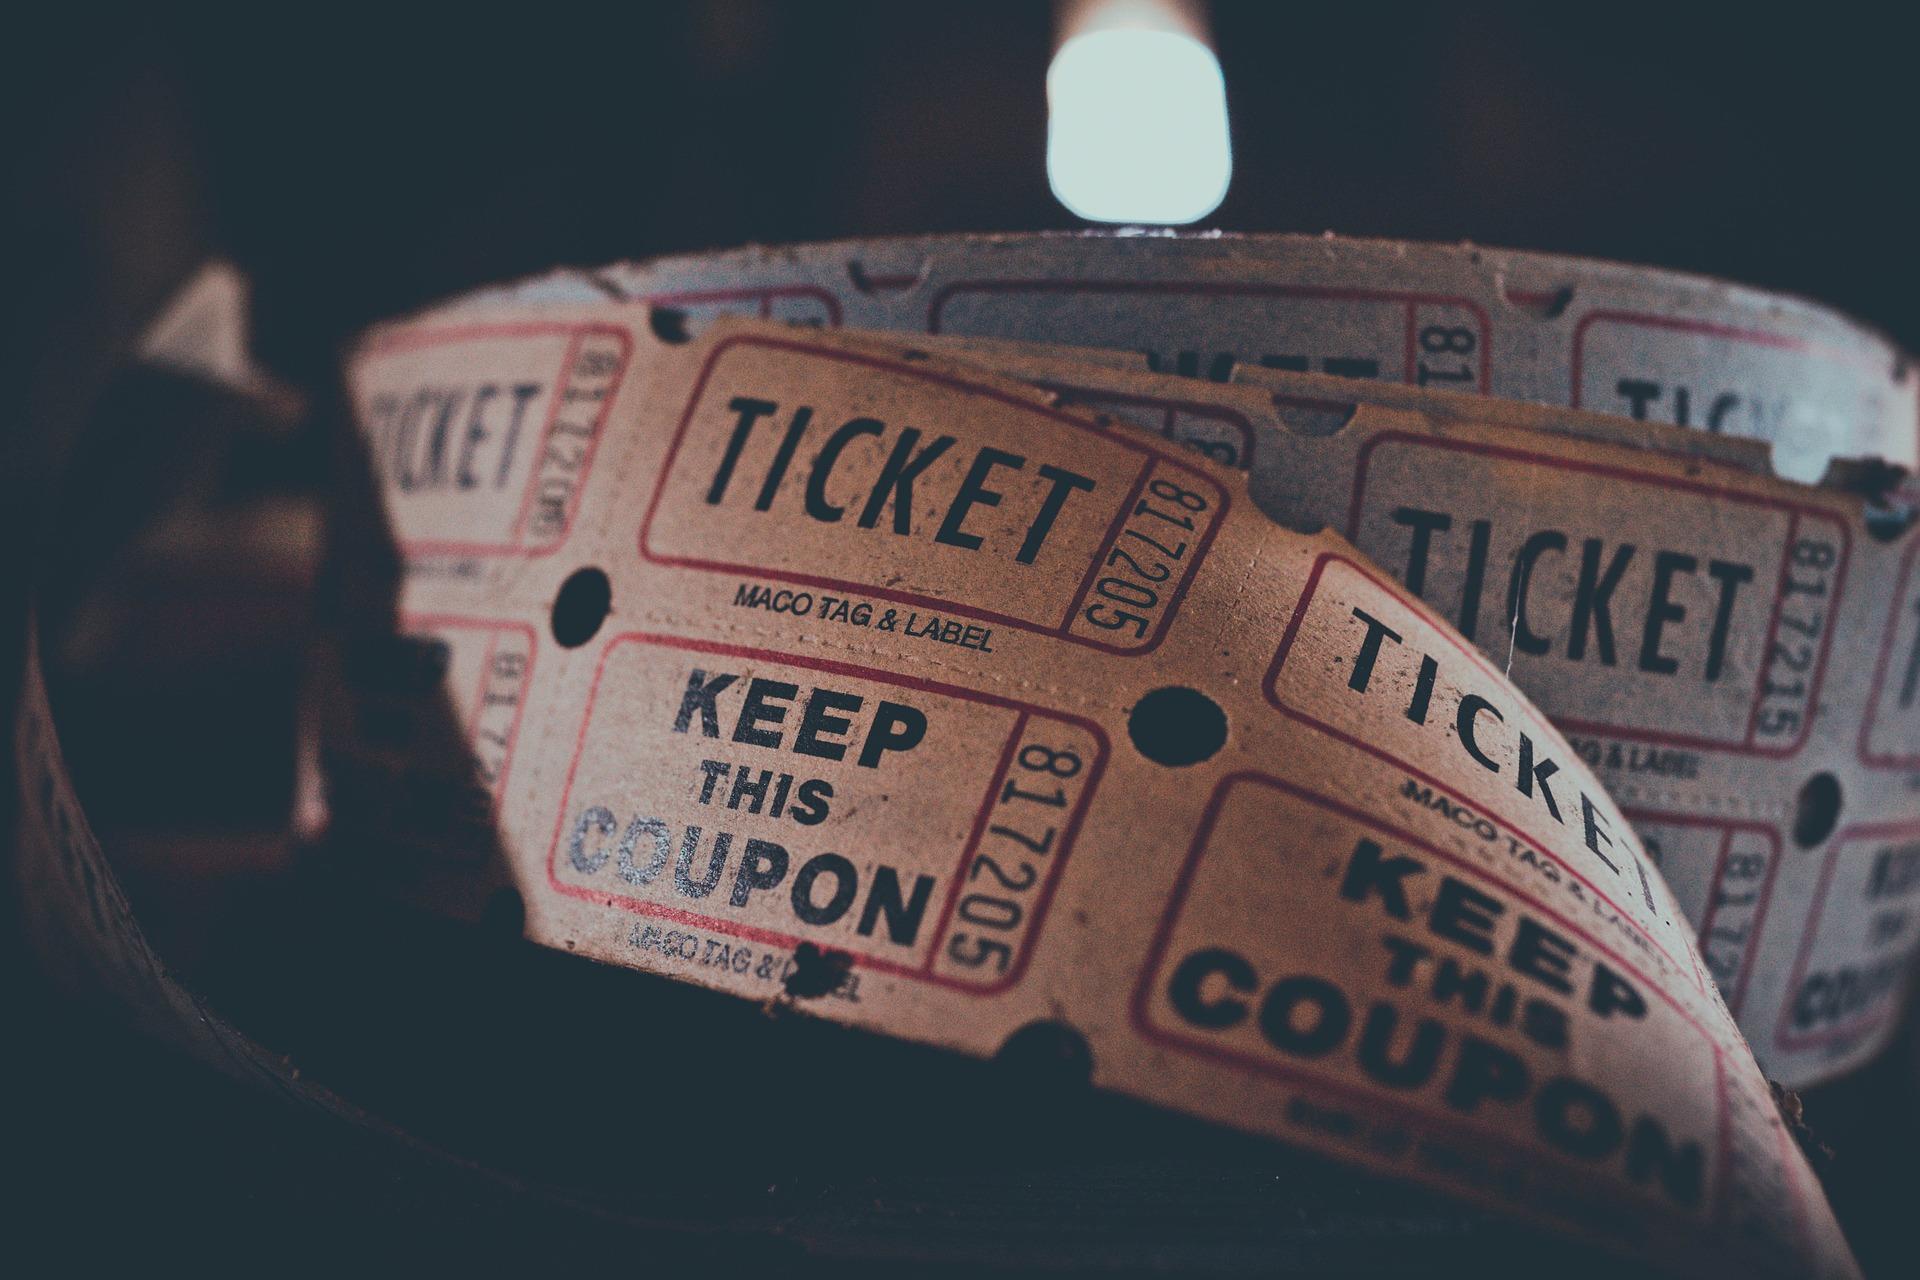 Des tickets de cinéma